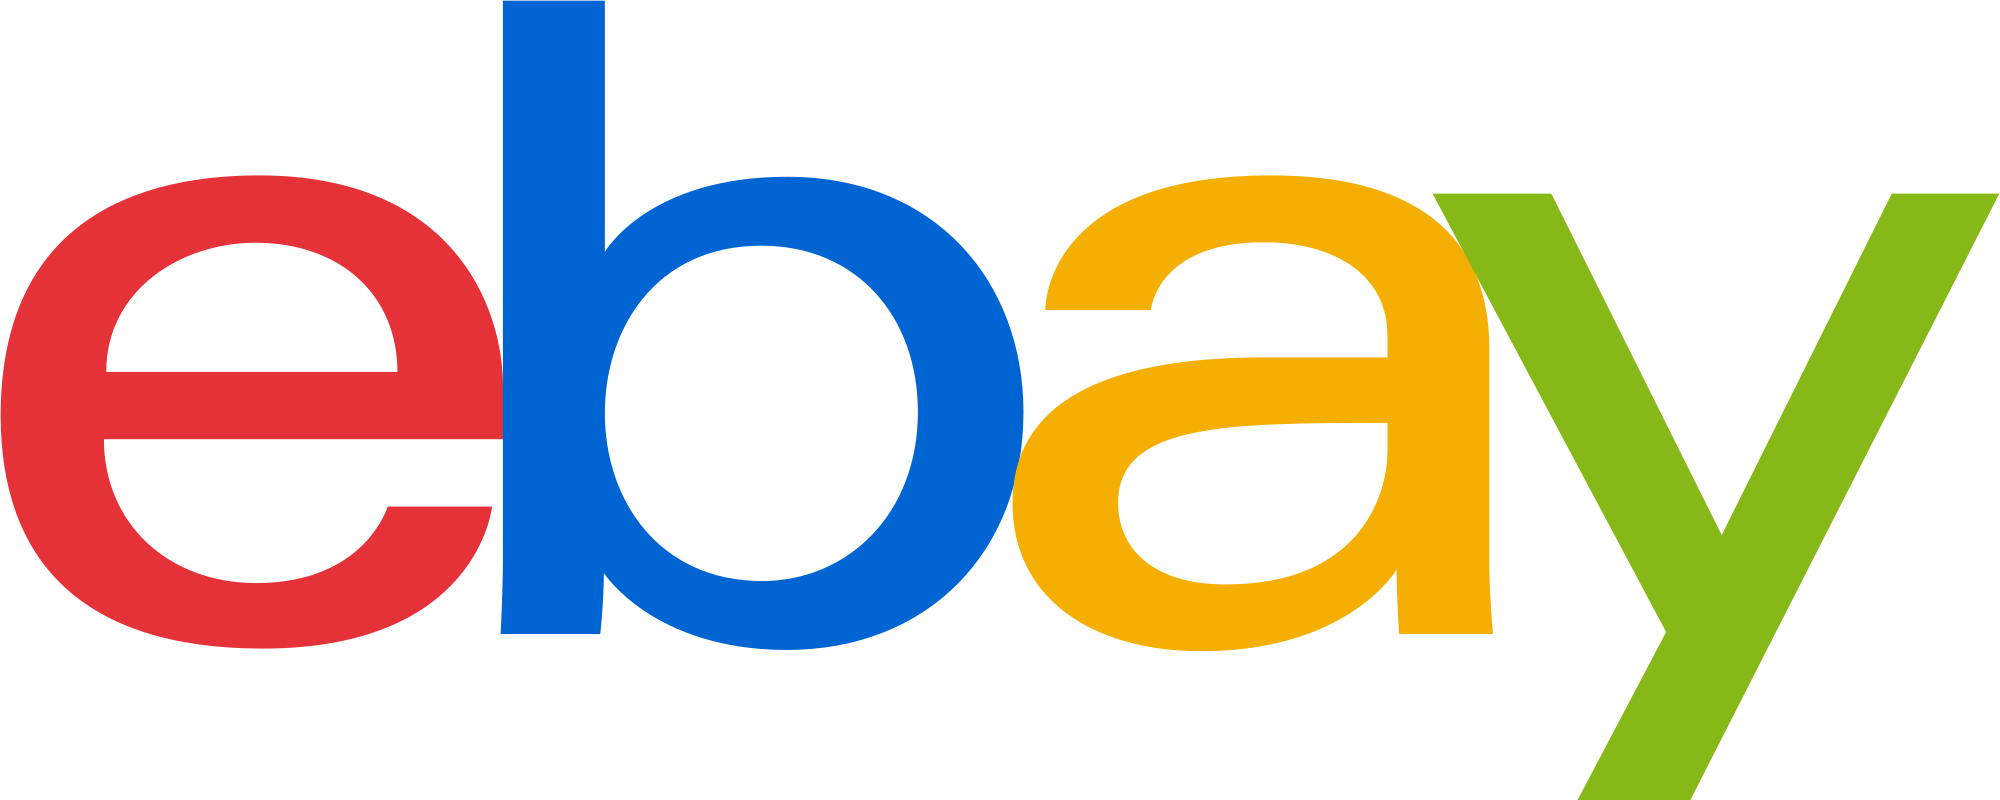 eBay Collectibles